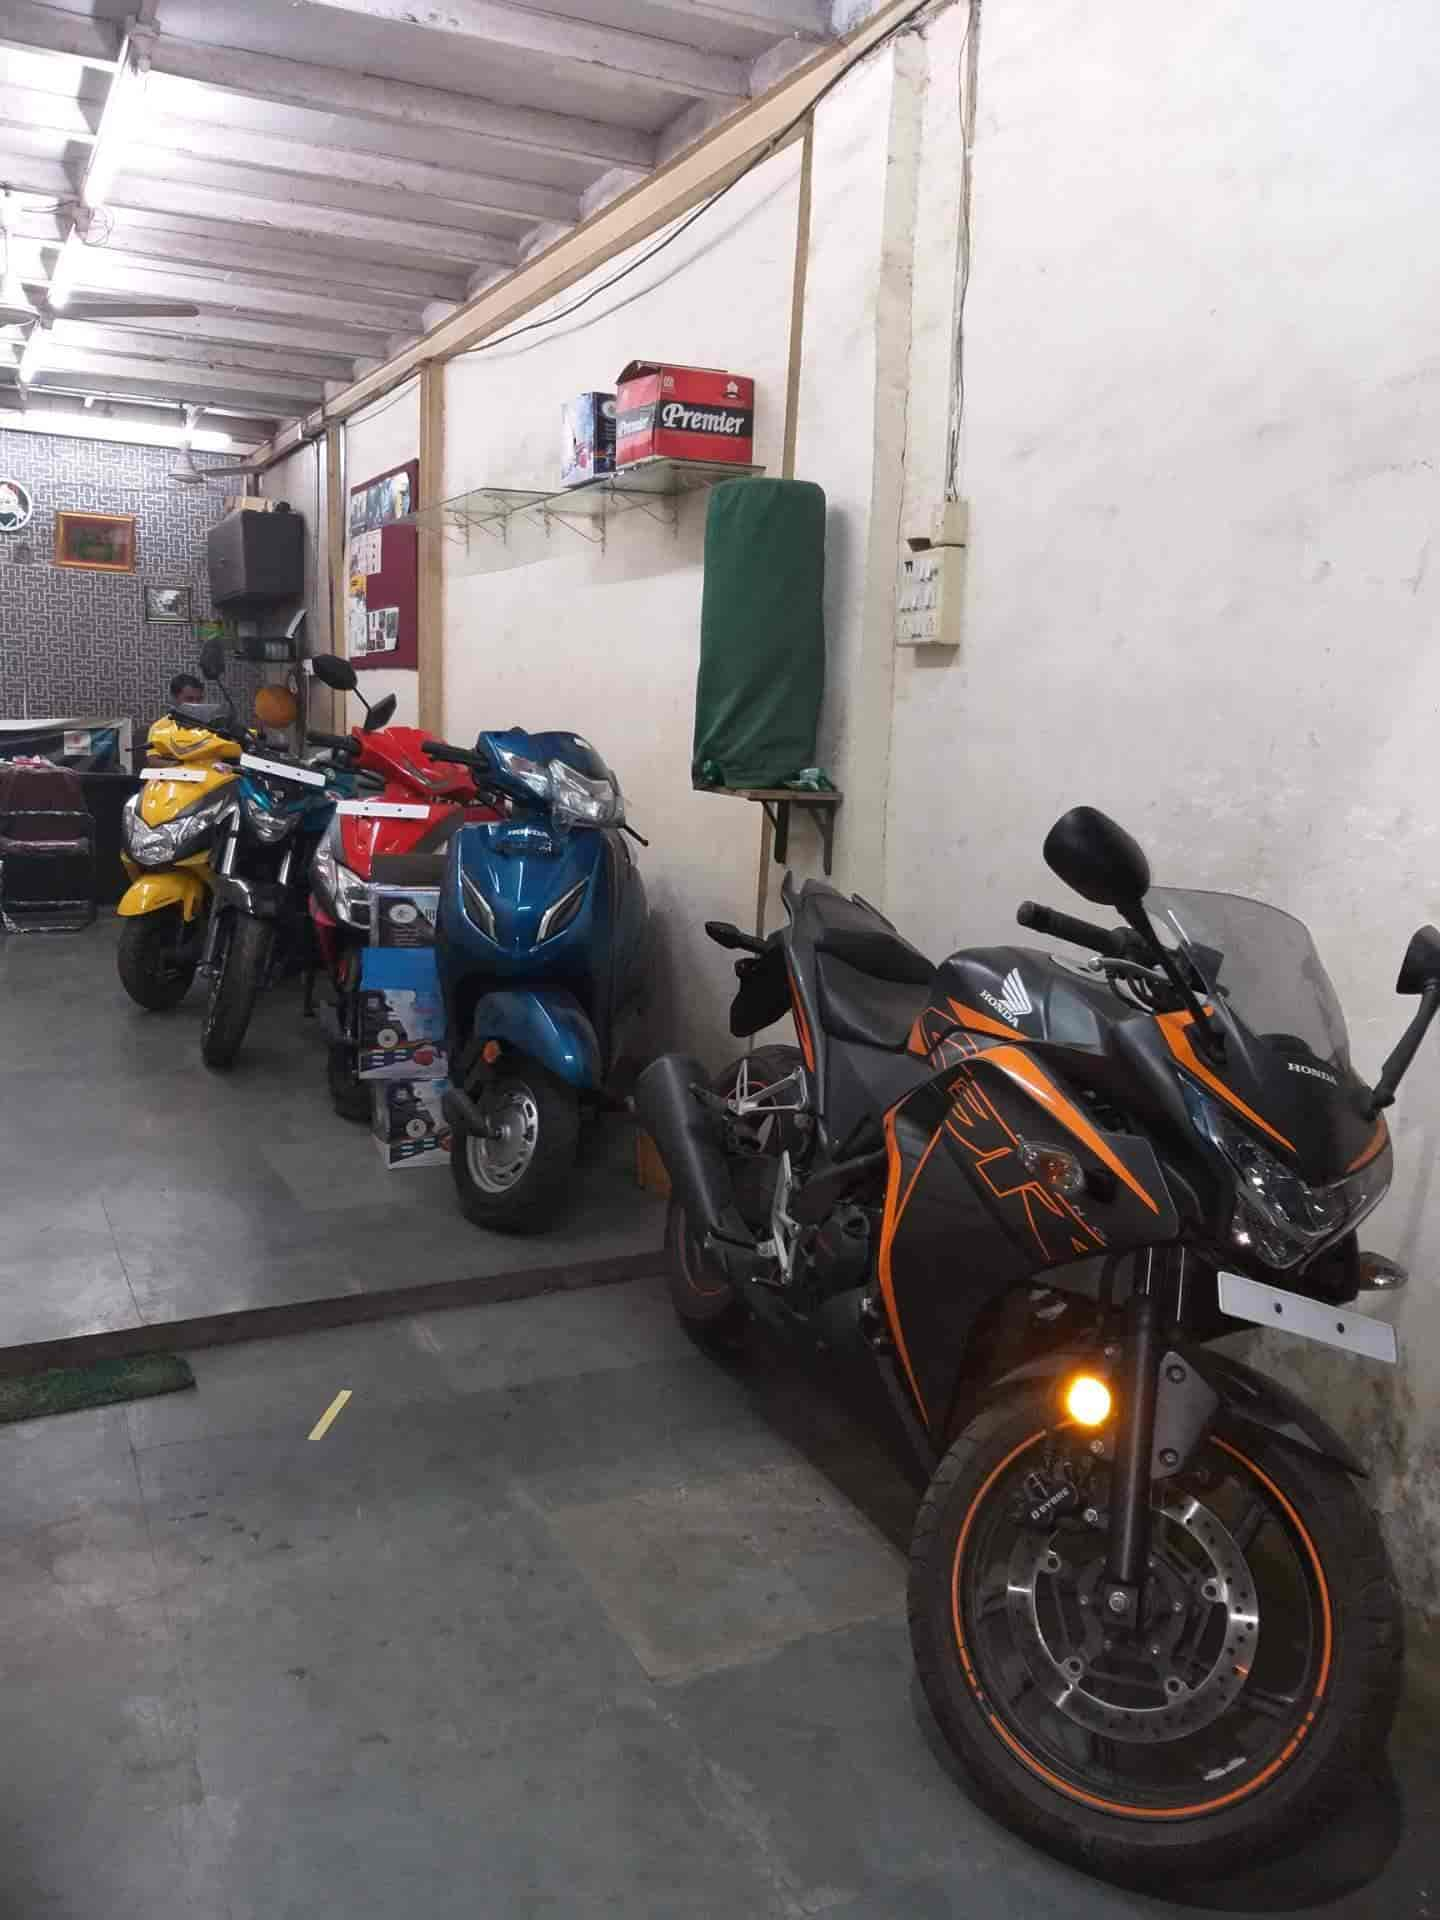 Bikers Choice, Kandivali East - Motorcycle Dealers in Mumbai